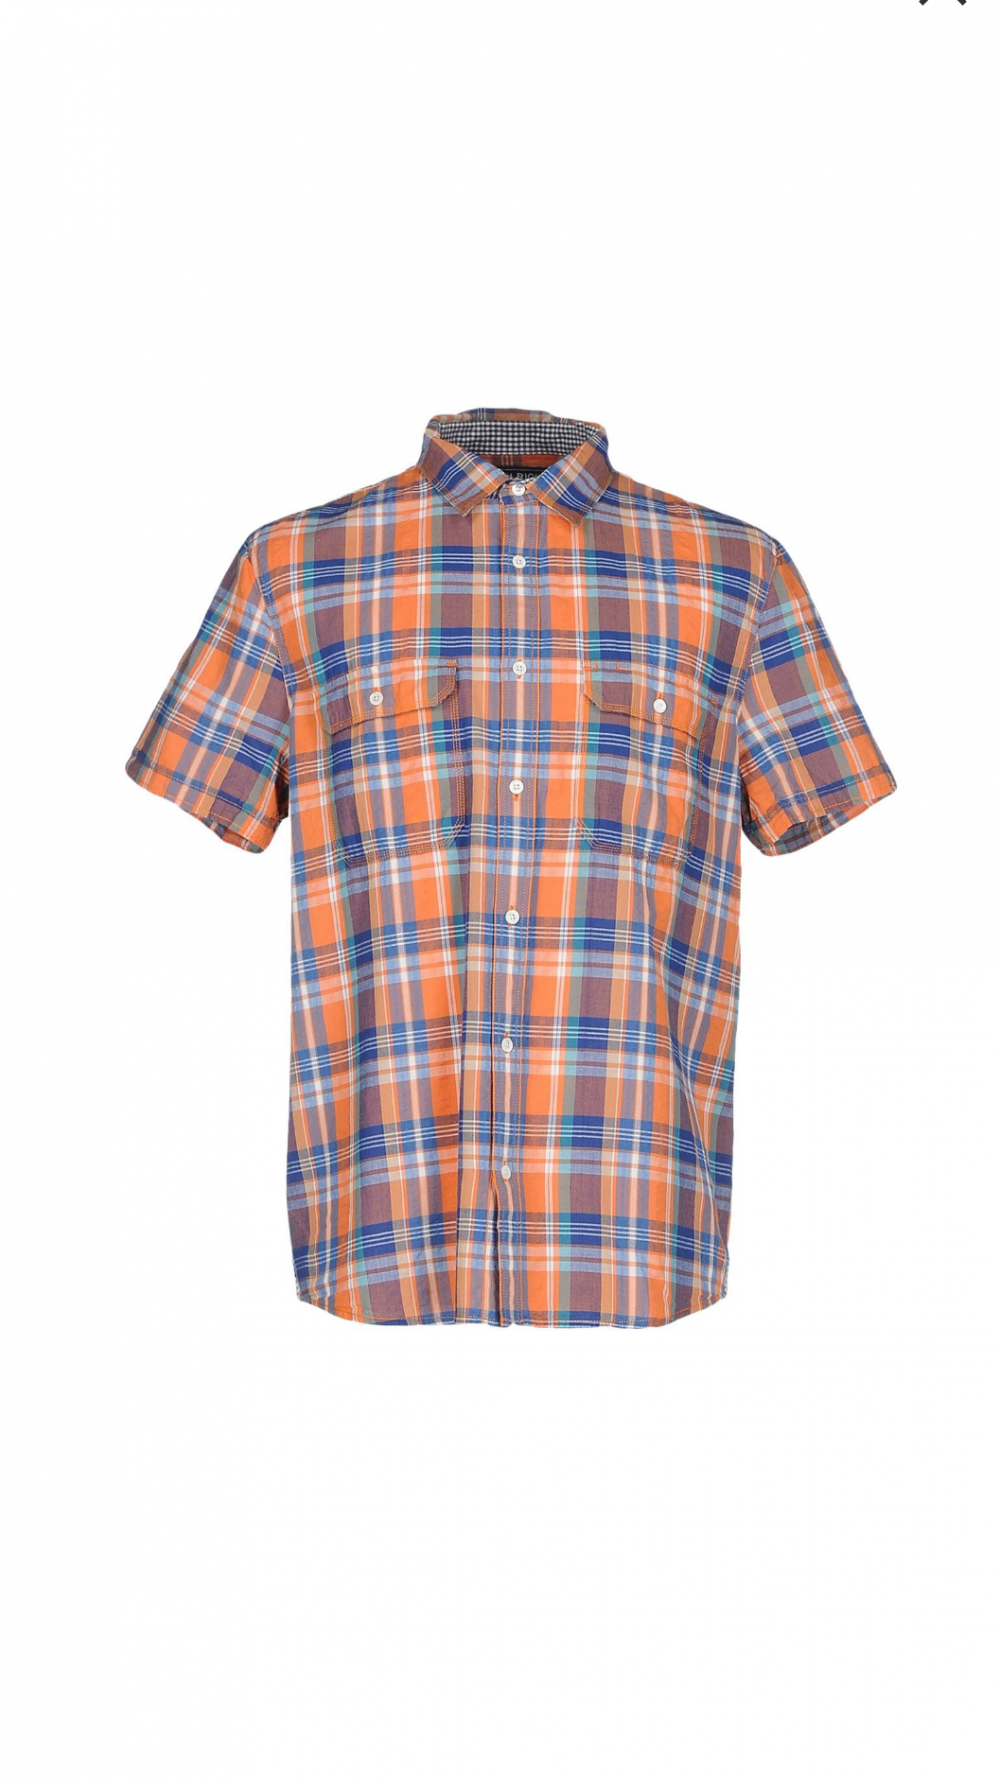 Рубашка Woolrich, размер М.